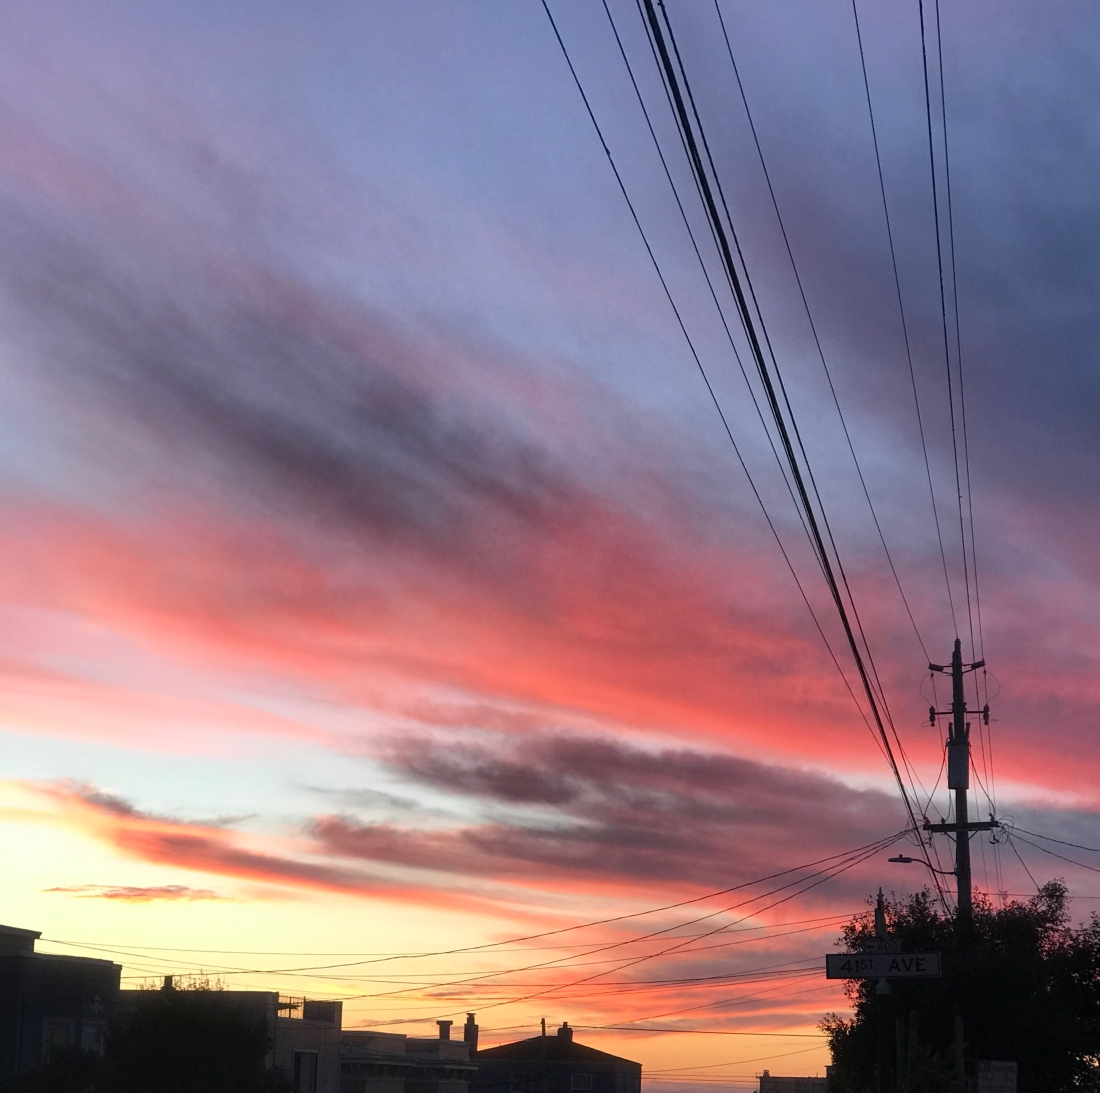 sunset-ii-12.21.2020.jpg